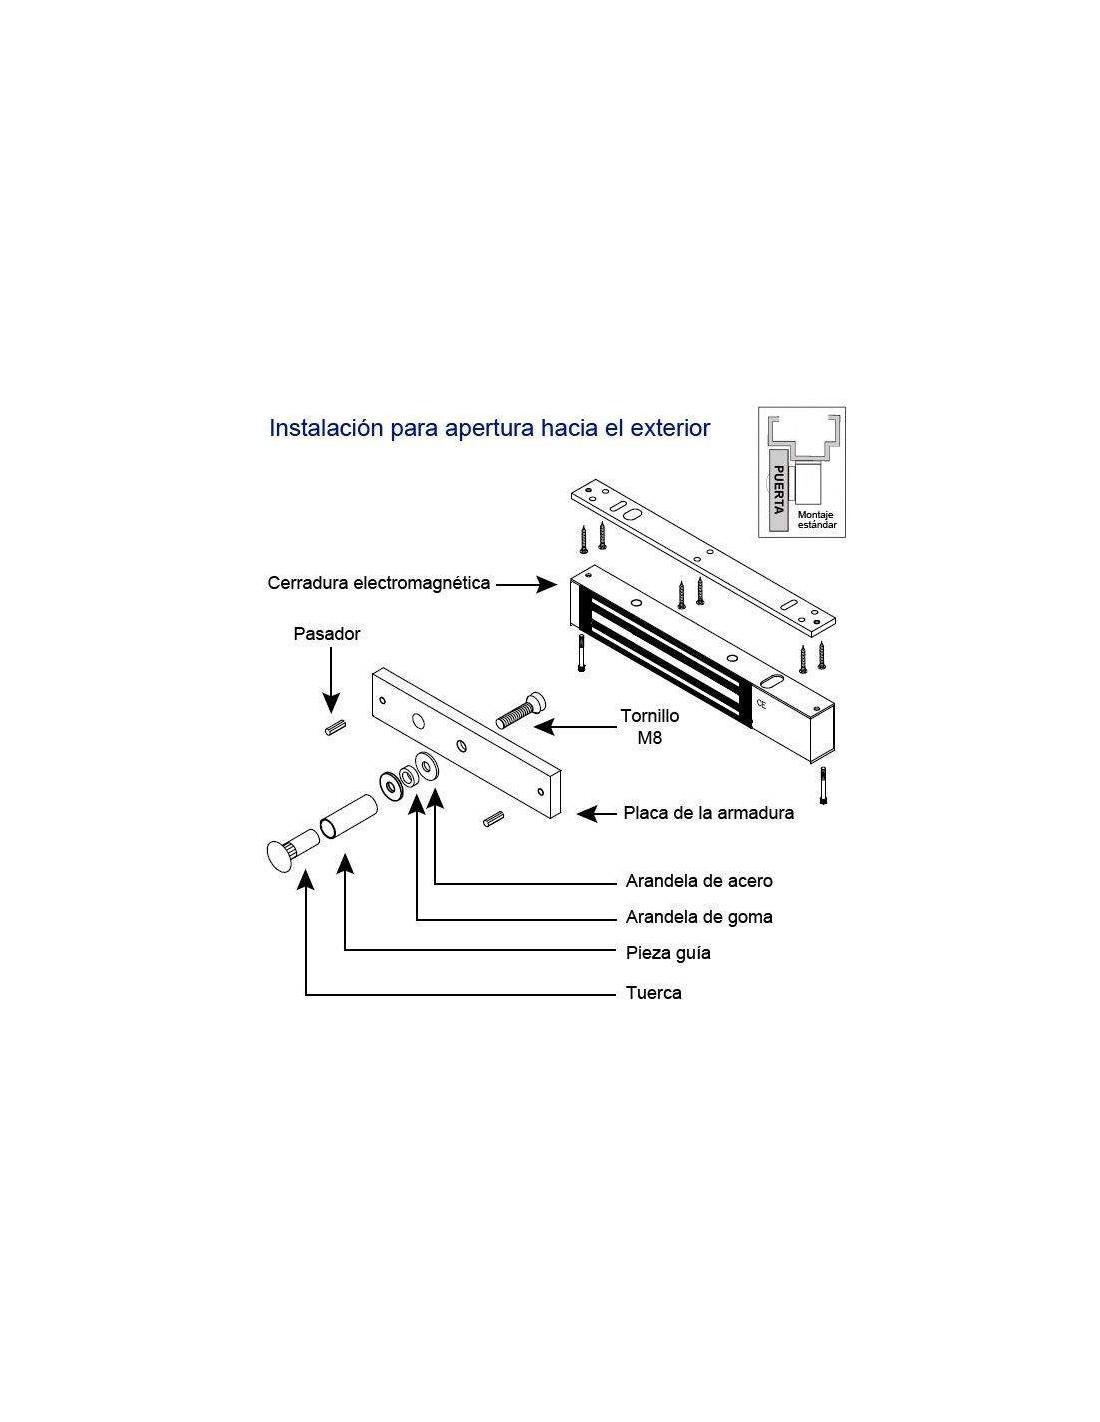 Instalacion electrica de superficie awesome cablematic caja de distribucin elctrica spn m ip de - Instalacion electrica superficie ...